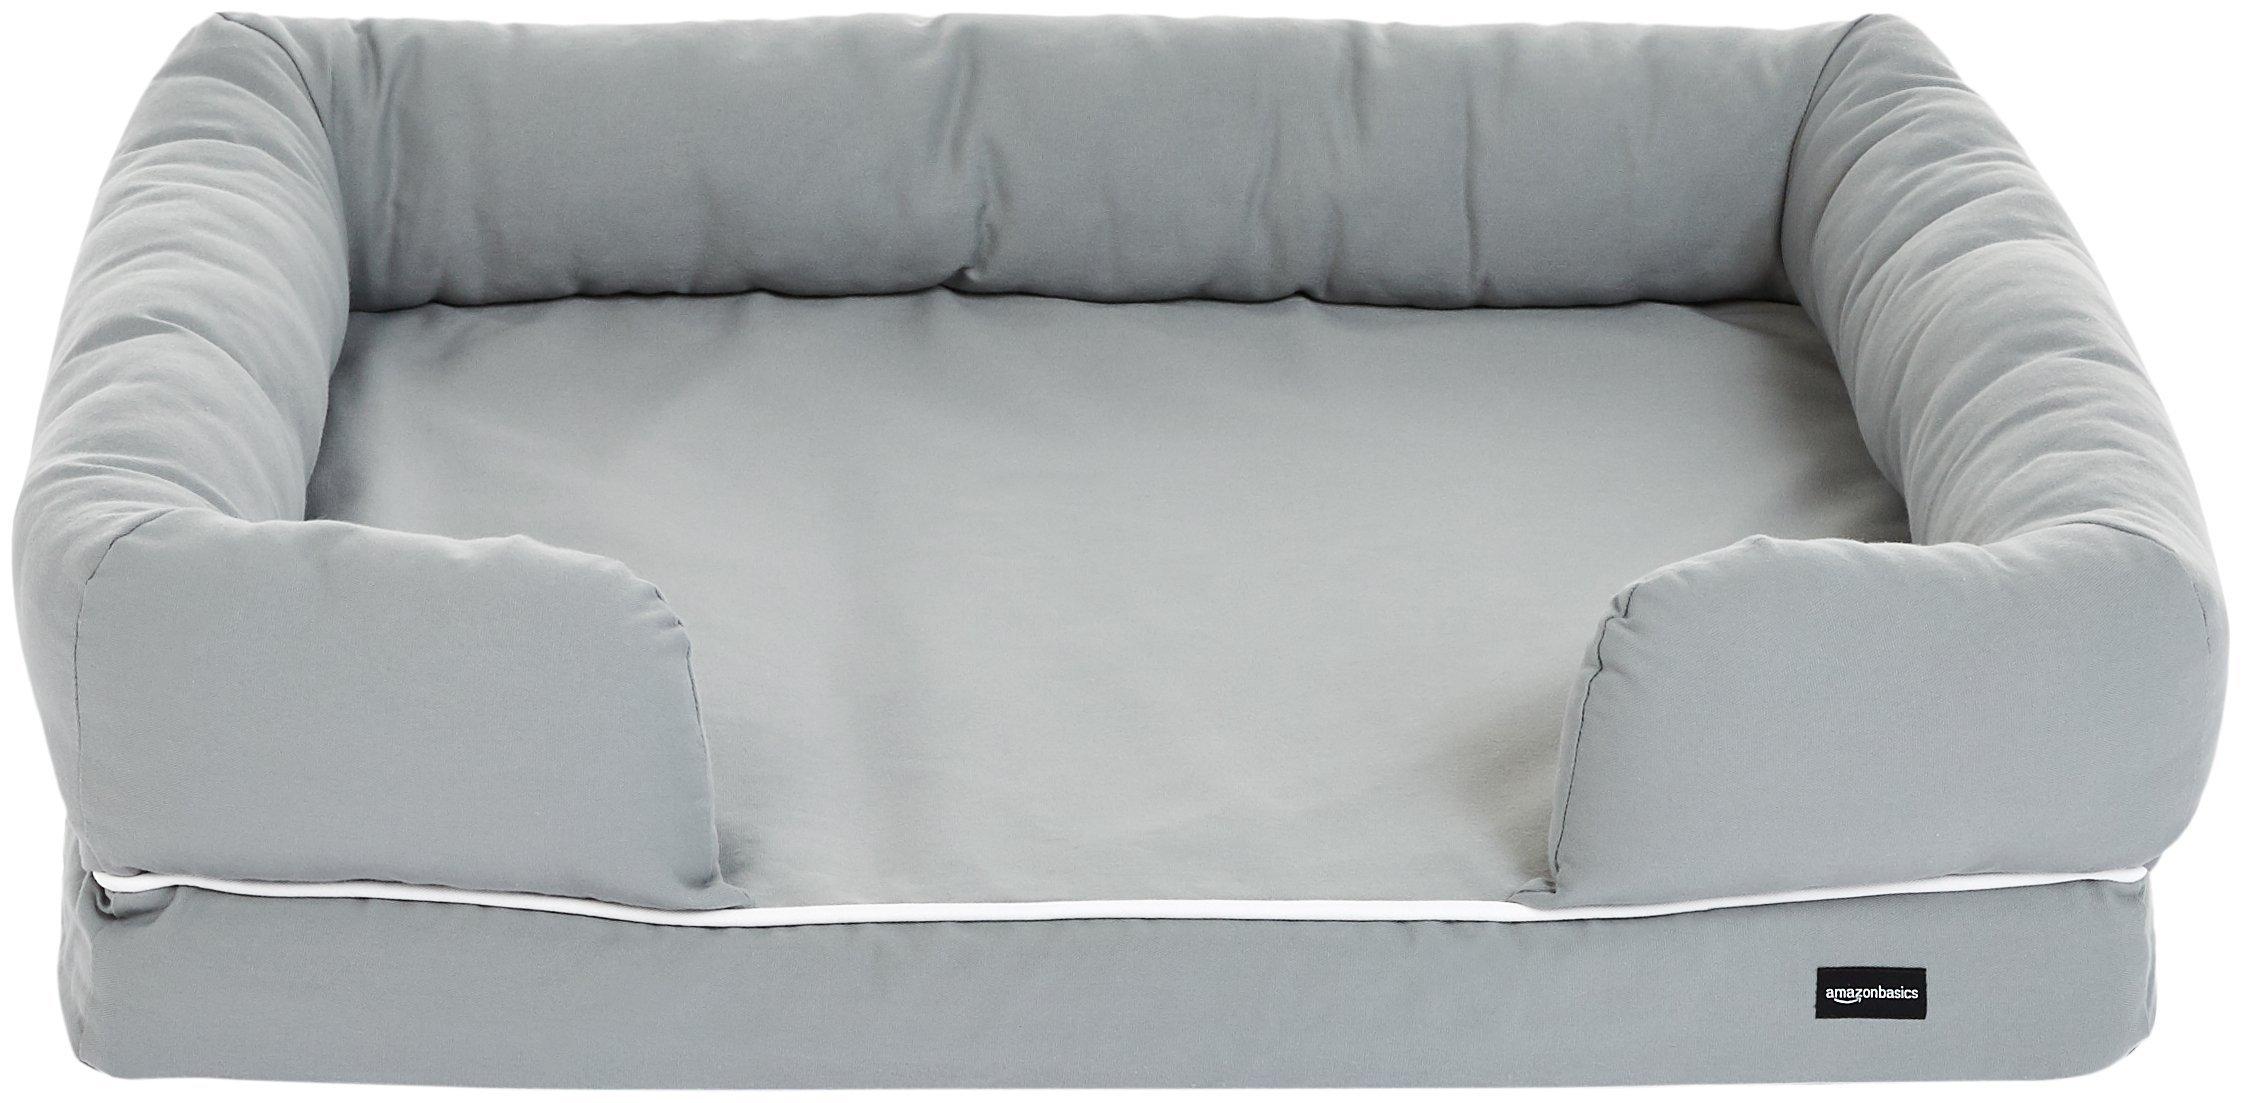 AmazonBasics Medium Pet Dog Sofa Bolster Lounger Bed - 36 x 29 x 9 Inches, Grey by AmazonBasics